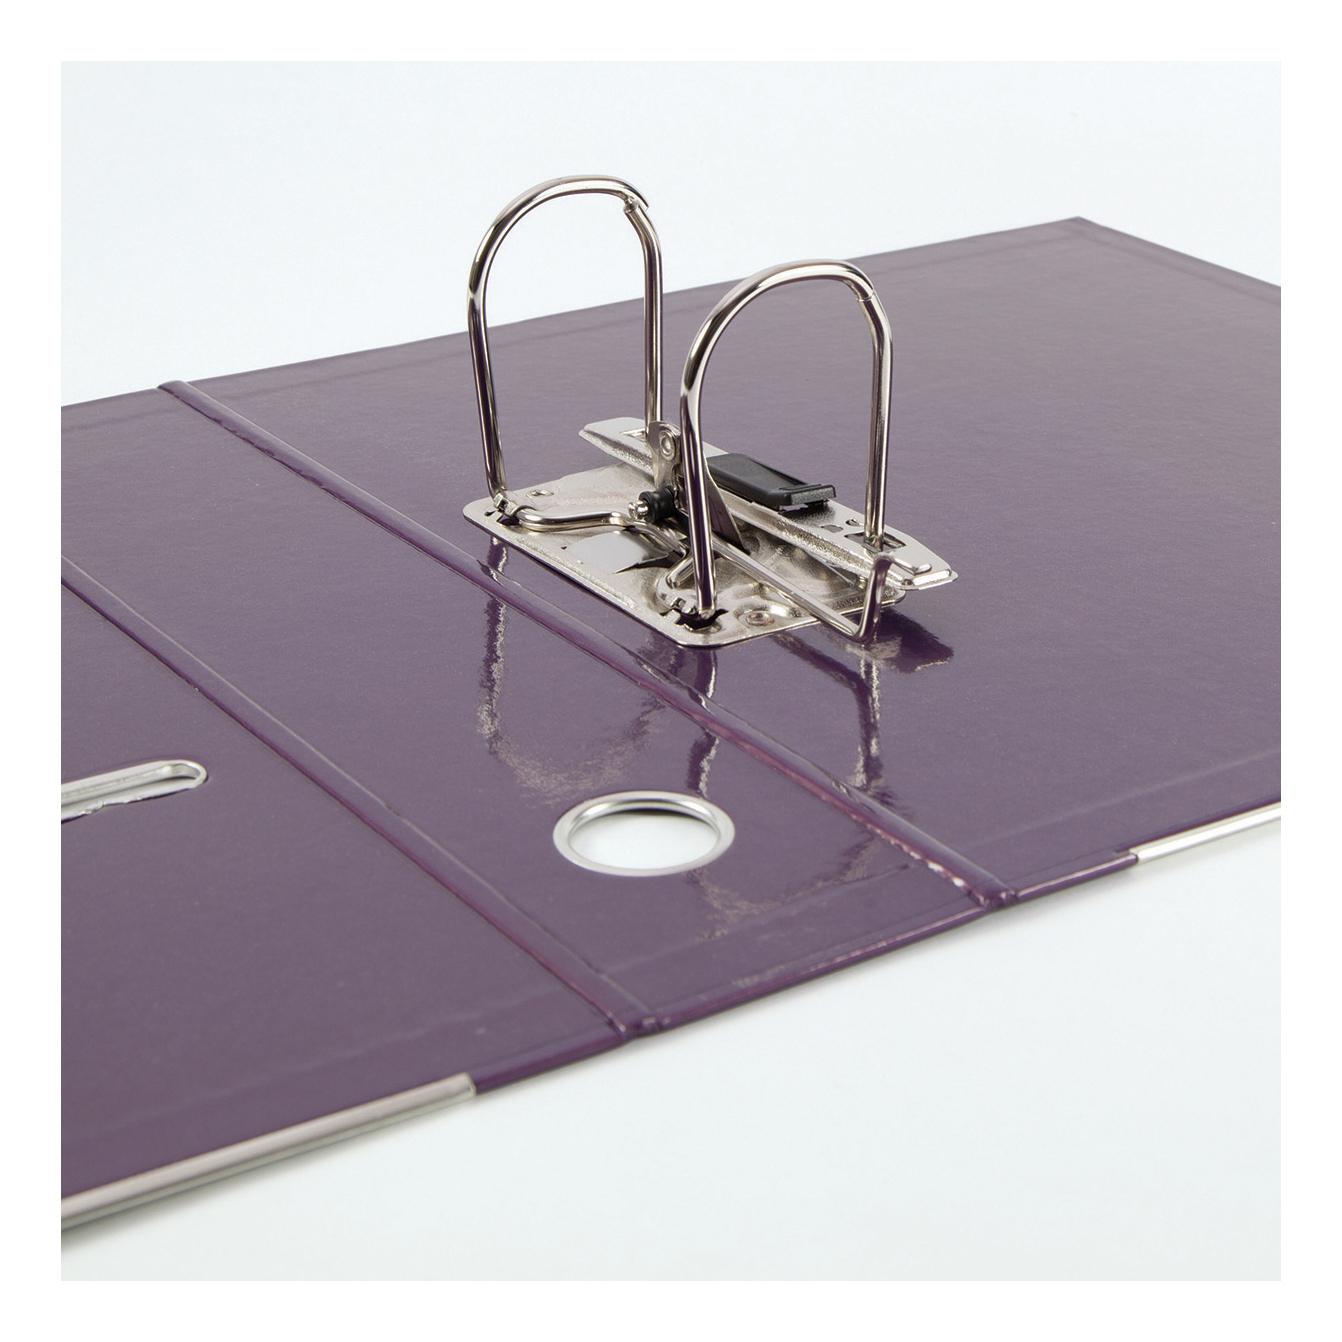 Elba Classy Lever Arch File A4 70mm Metalic Purple Ref 400021021 [3 for 2] Jan-Dec 2019